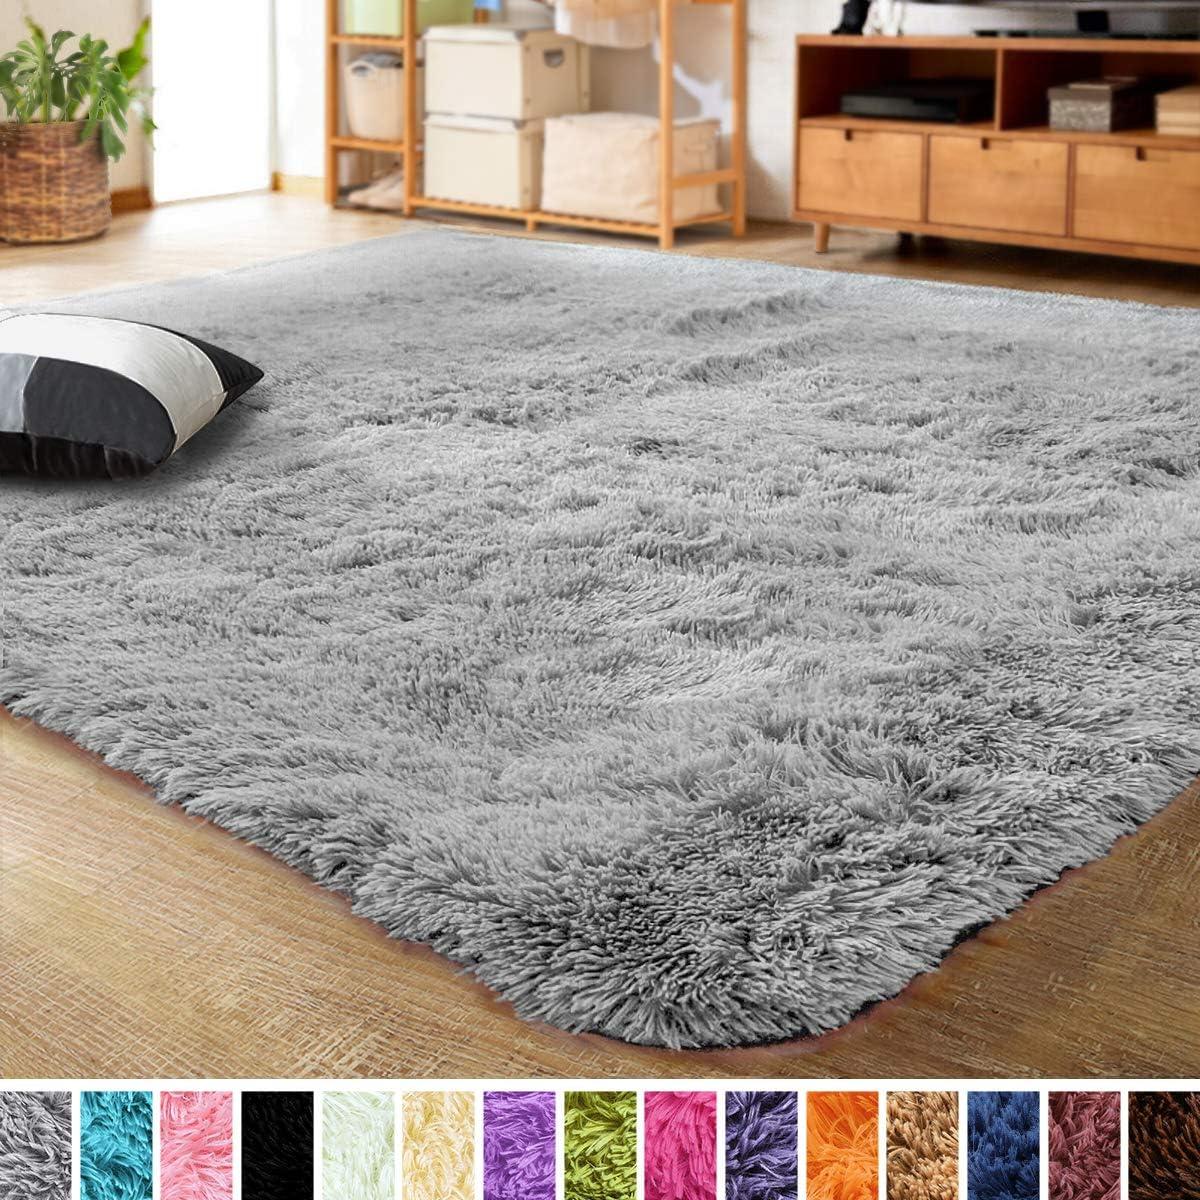 best carpet for bedrooms